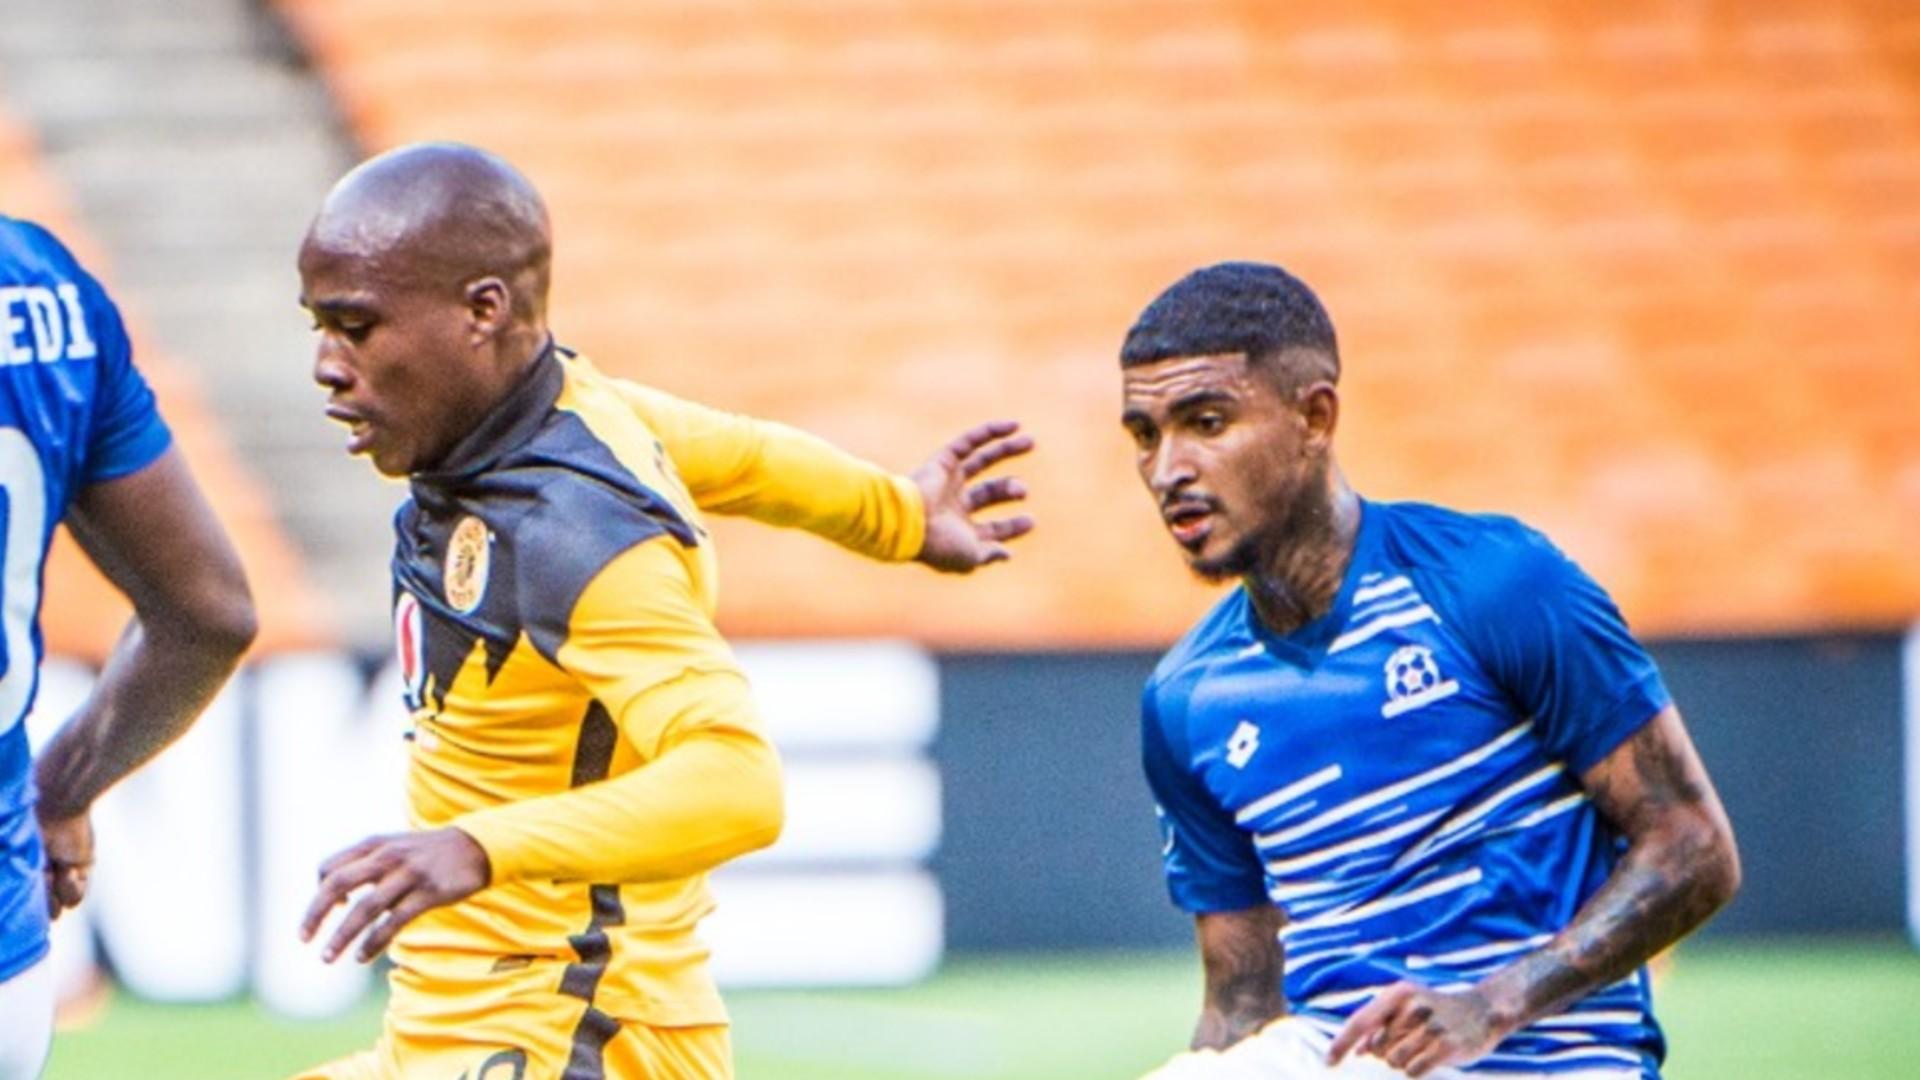 'Watch this space, McCarthy can coach Messi' - AmaZulu's Zungu